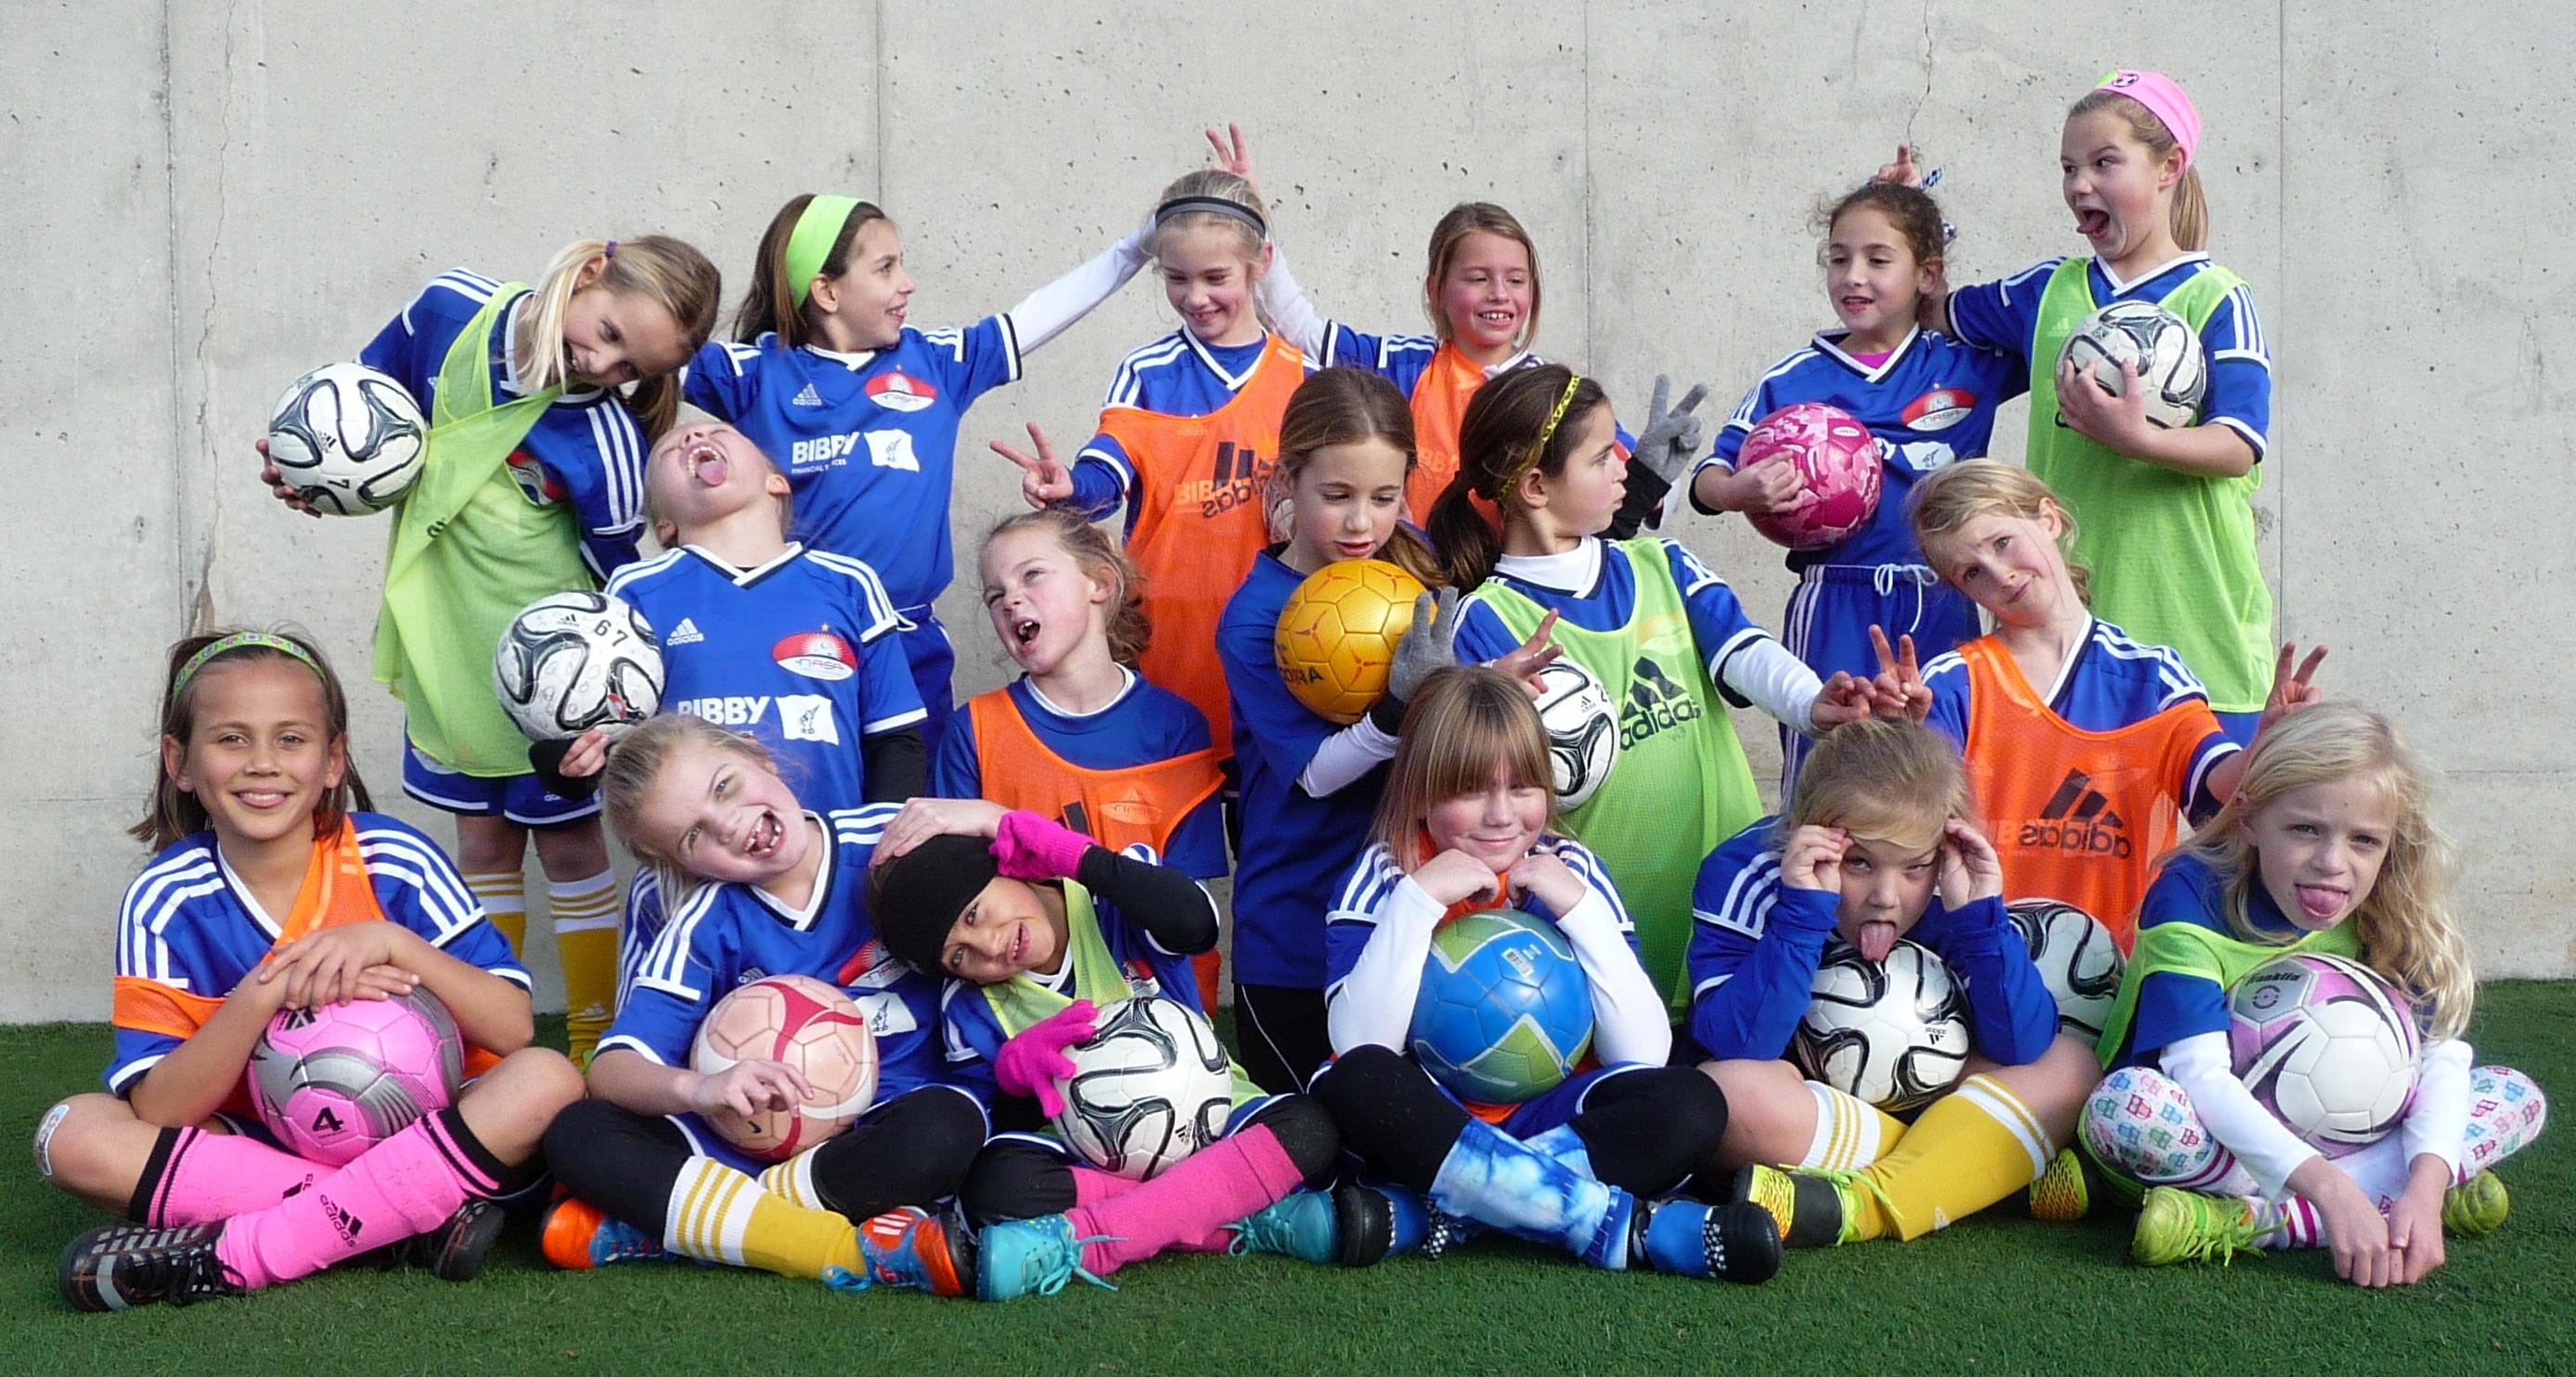 nasa soccer girls - photo #21